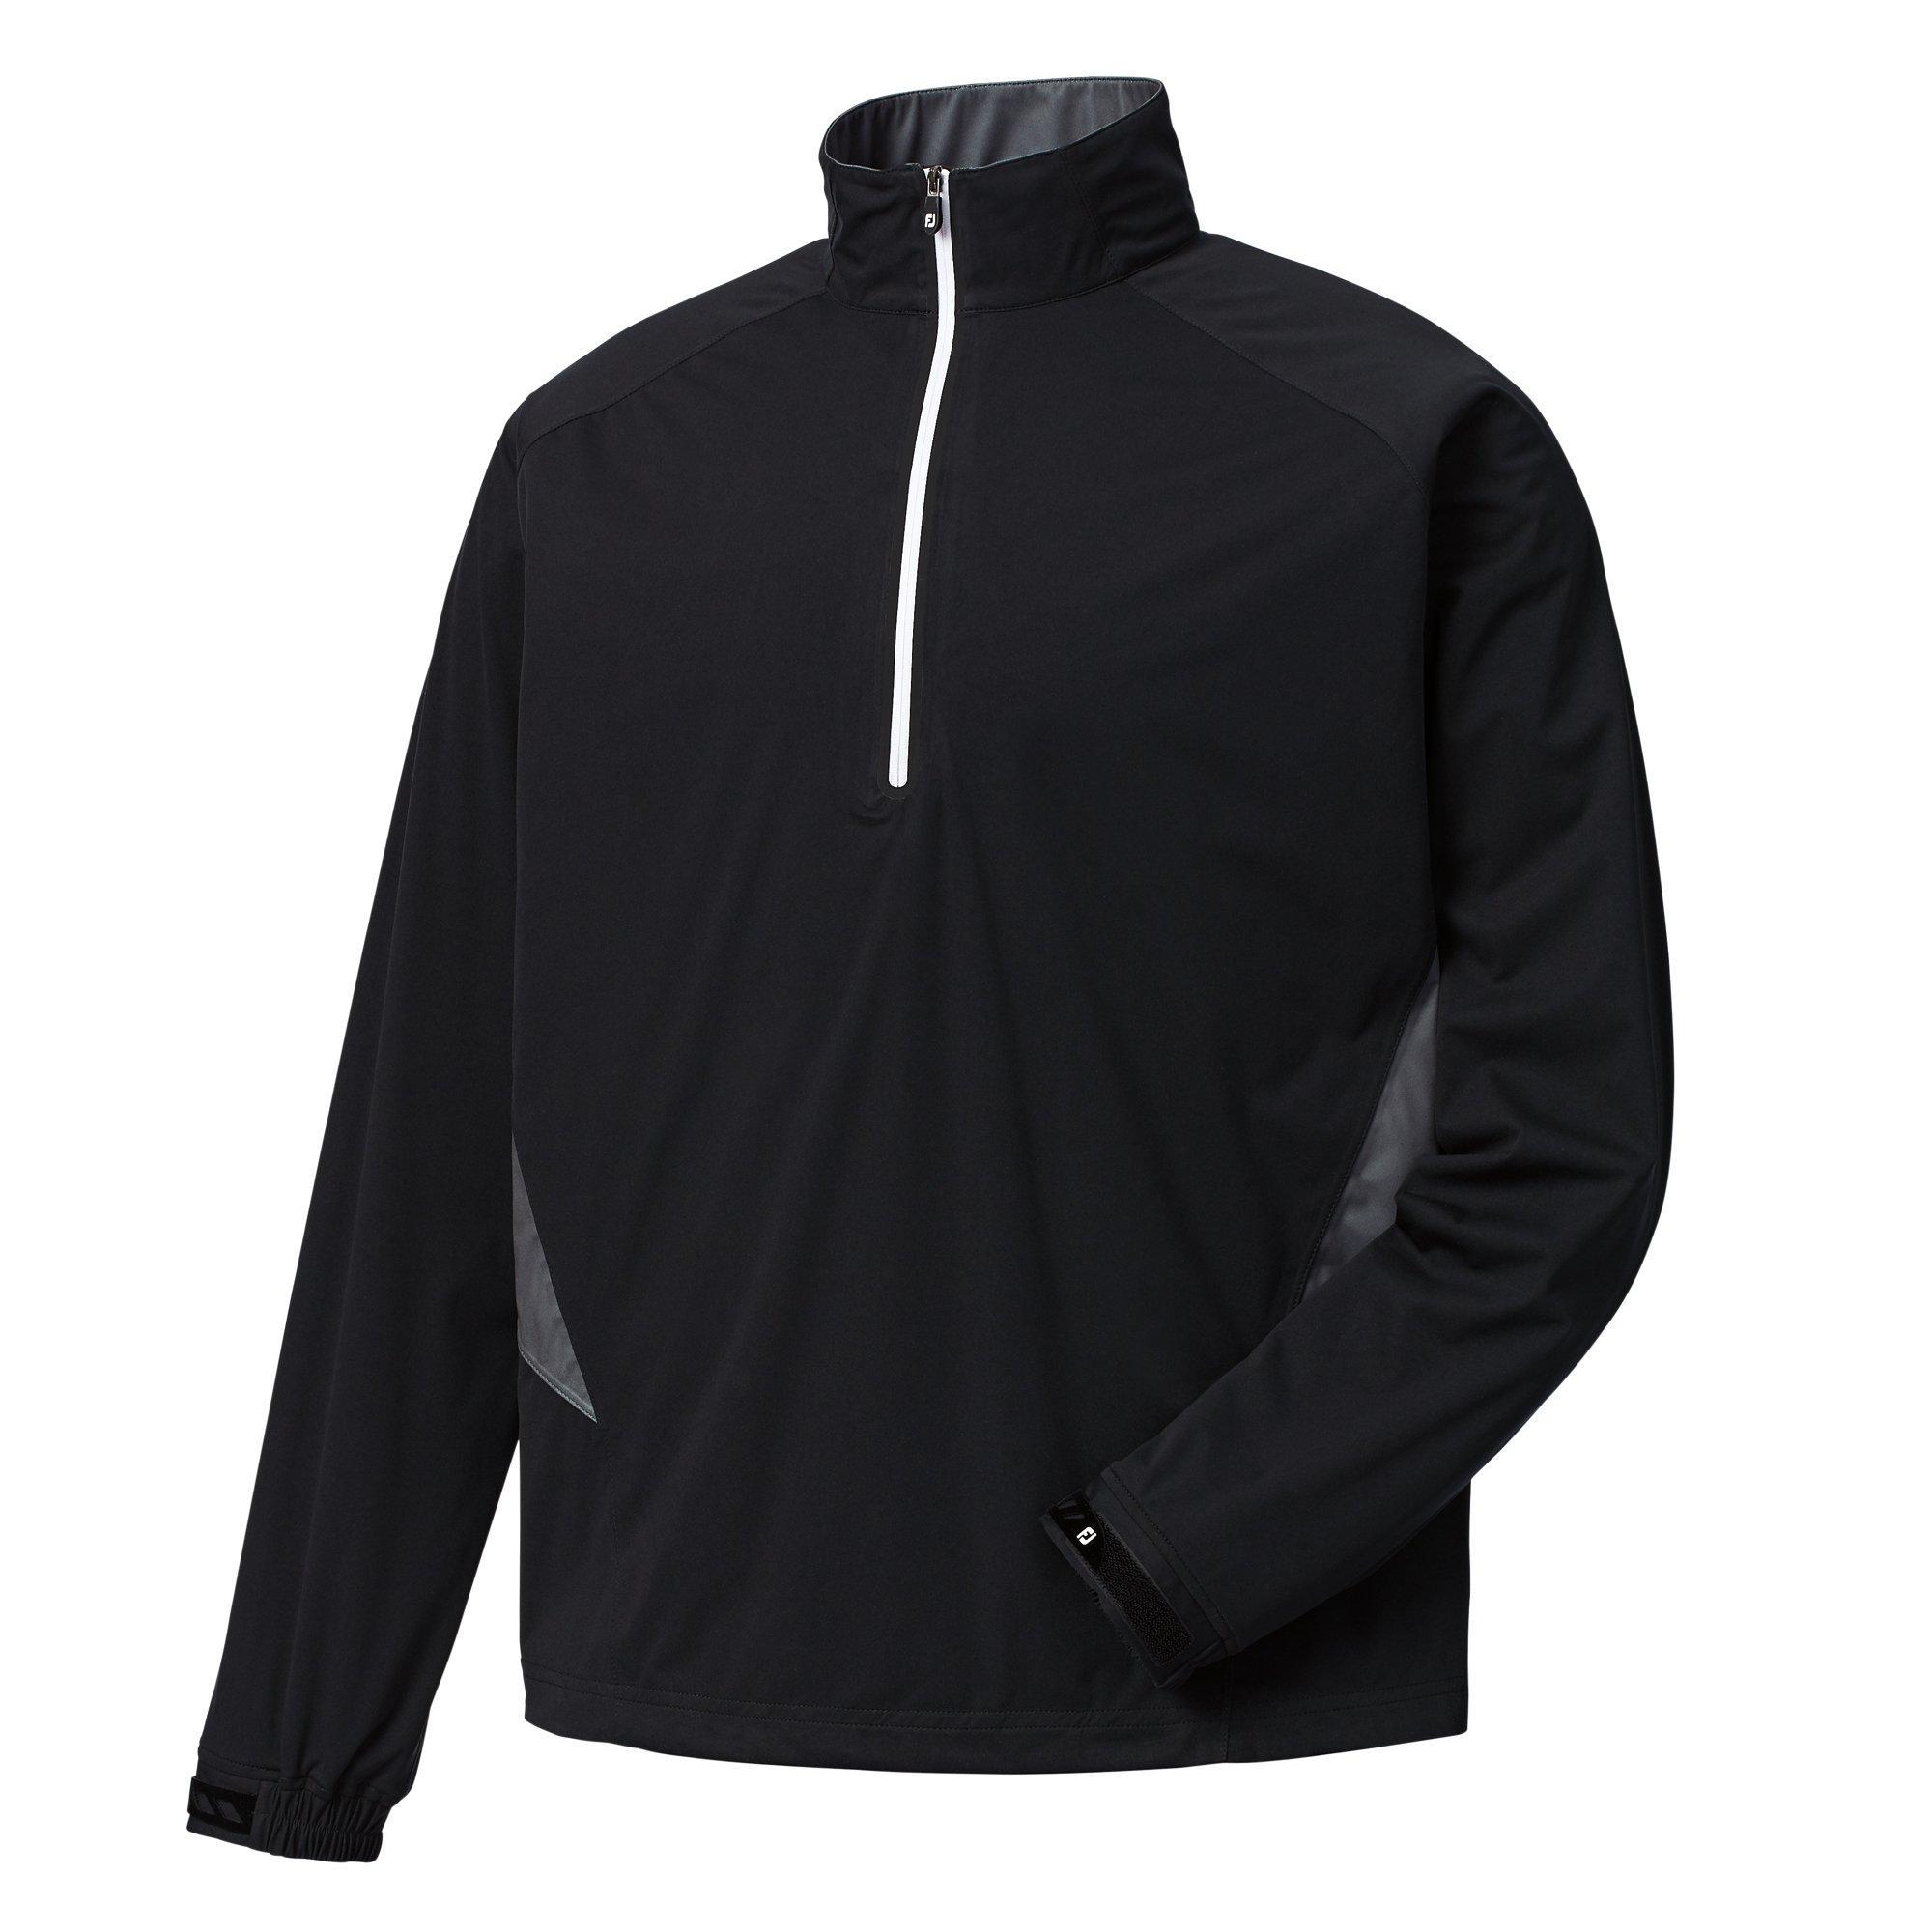 Men's Hydroknit 1/2 Zip Rain Jacket